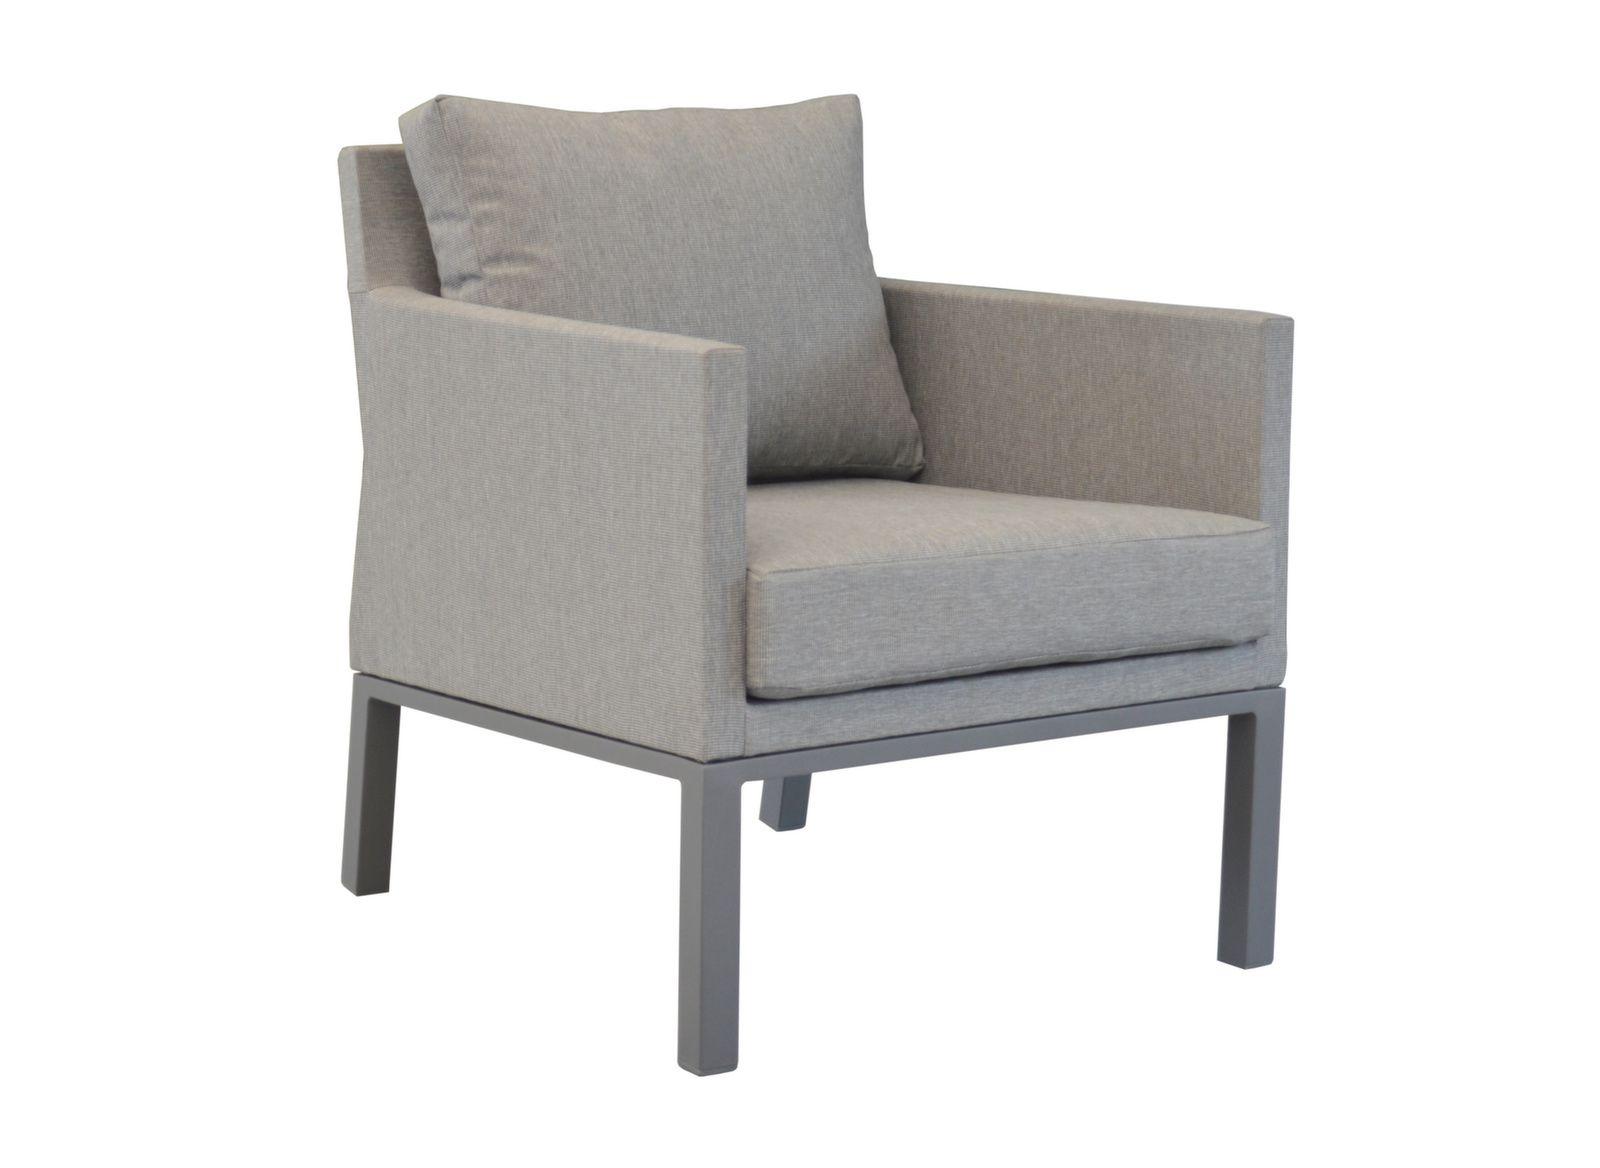 fauteuil d tente bergen tpep mat fauteuils de jardin. Black Bedroom Furniture Sets. Home Design Ideas